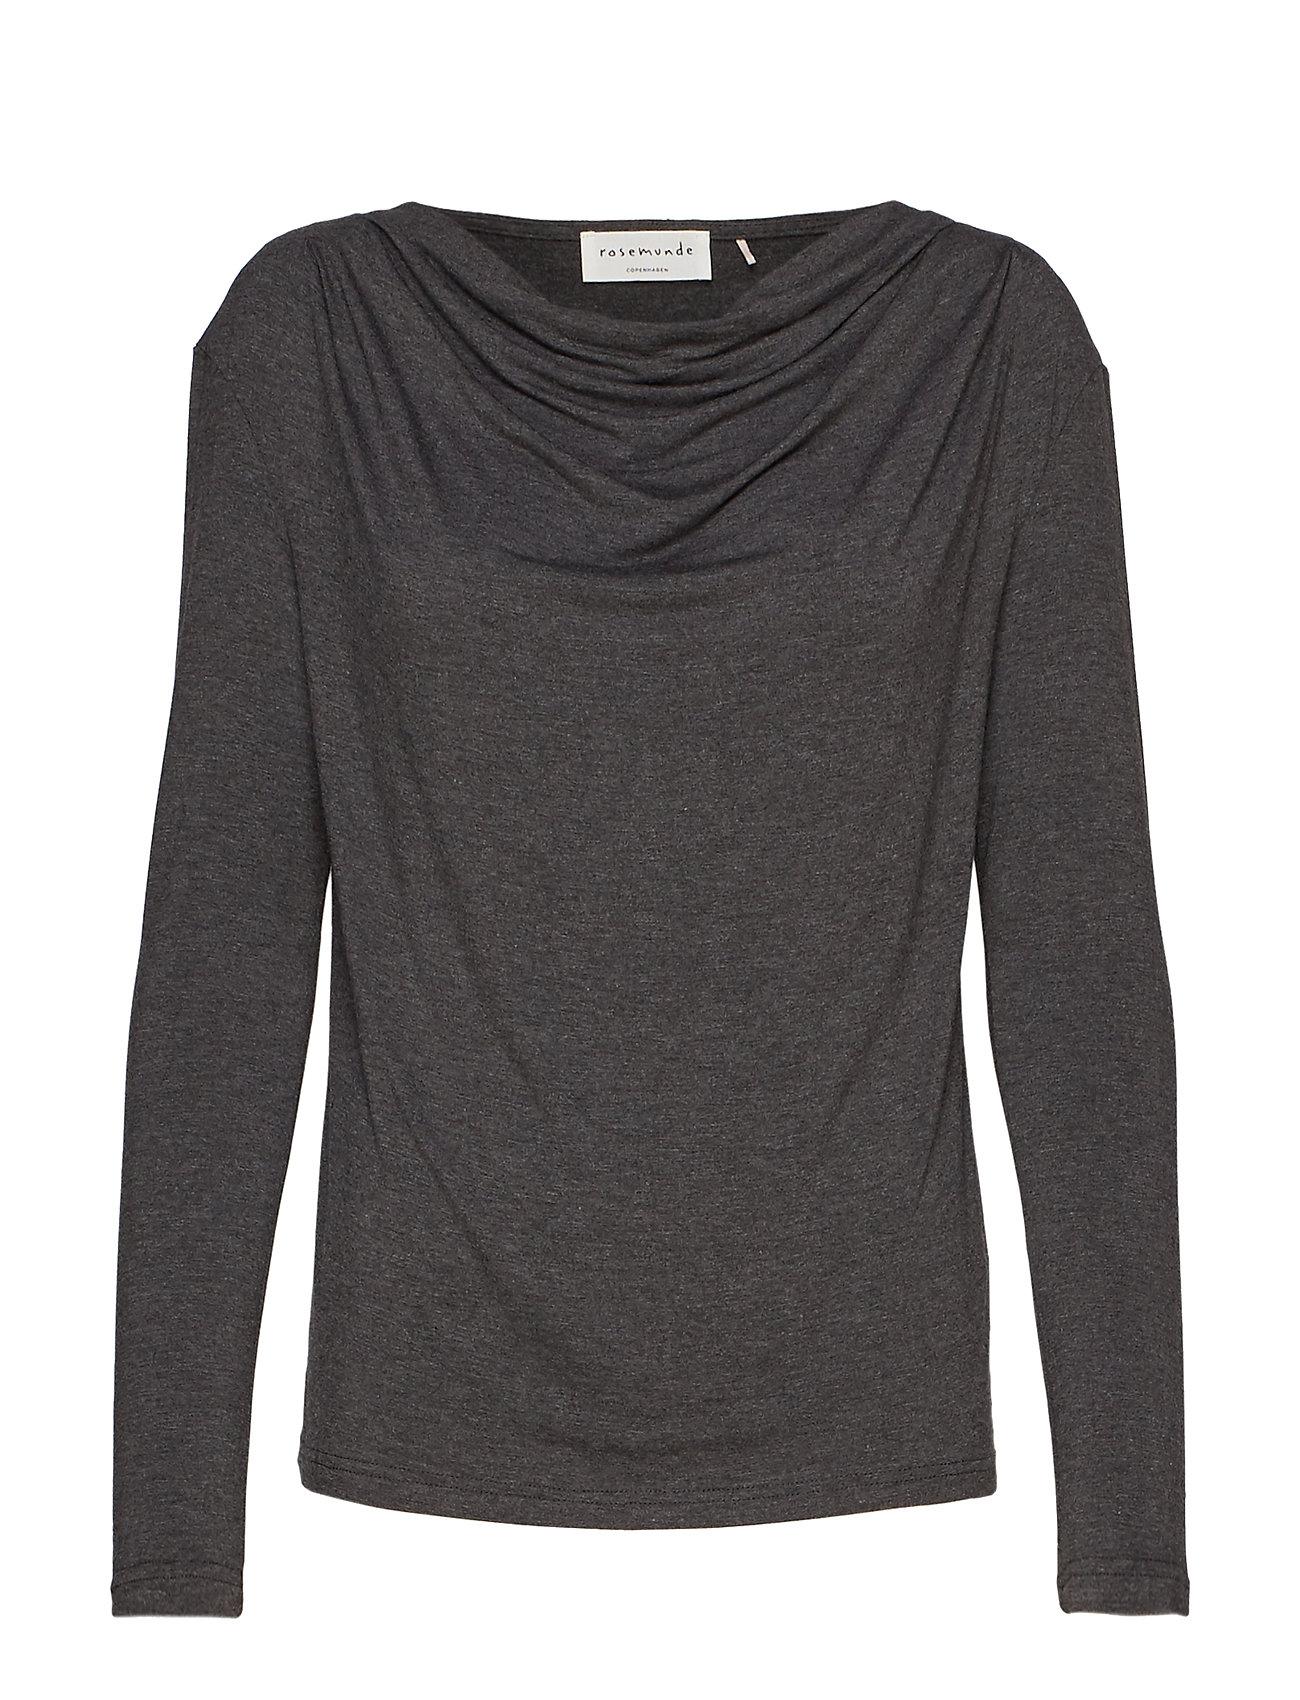 Rosemunde T-shirt ls - DARK GREY MELANGE